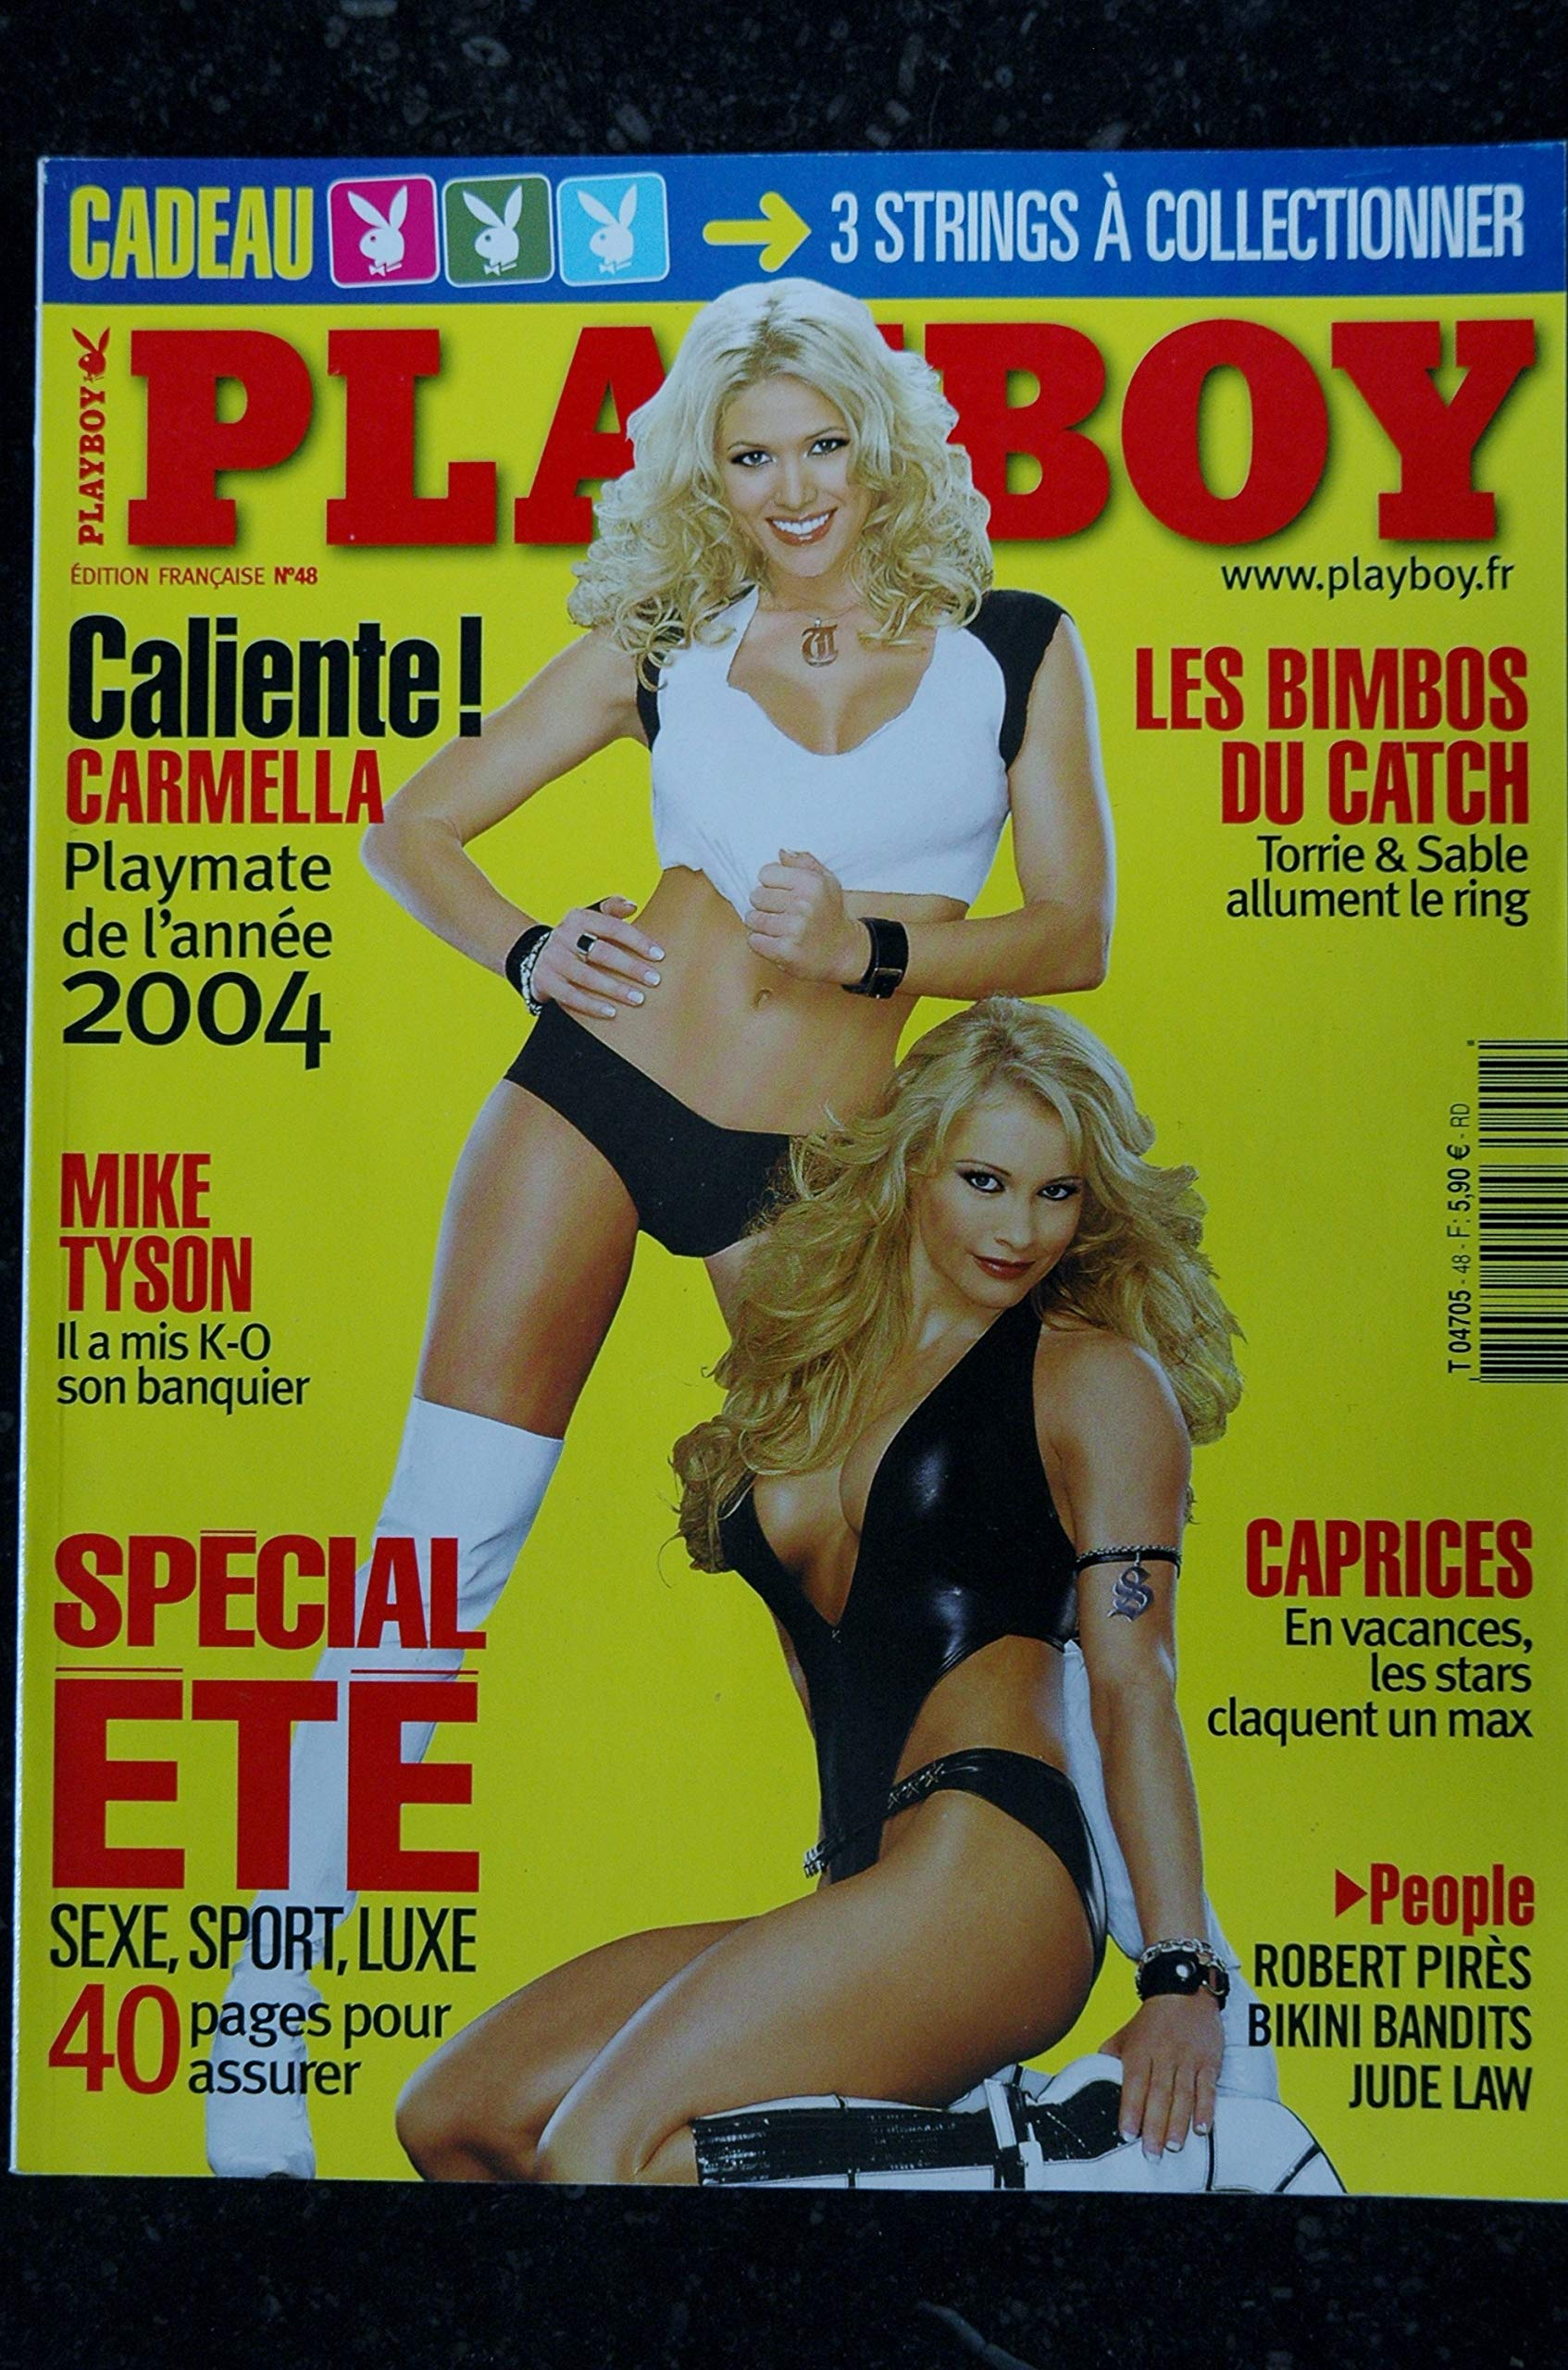 Melzer playboy anja TV presenter